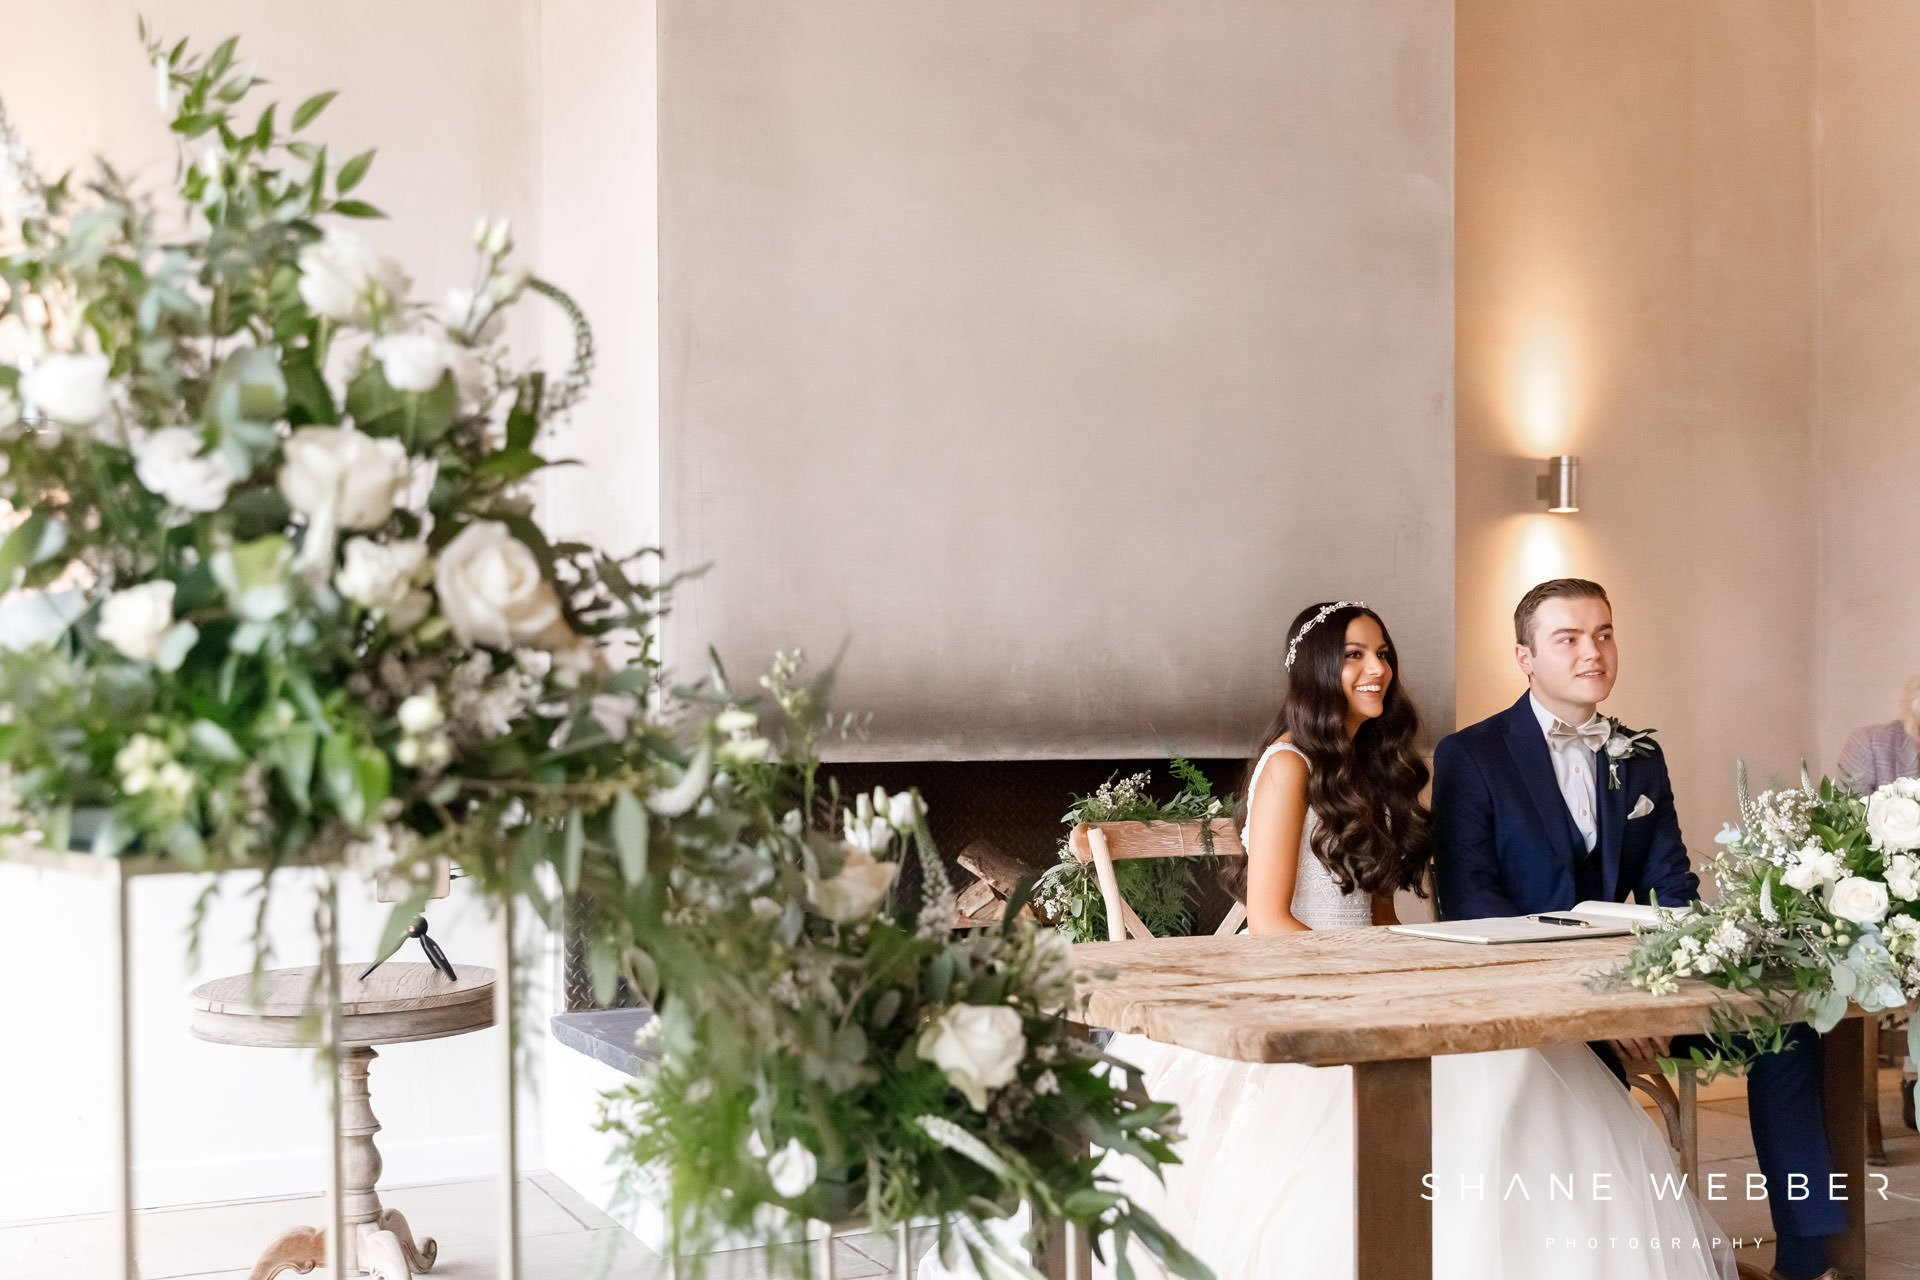 Signing the register at Thorpe Garden wedding